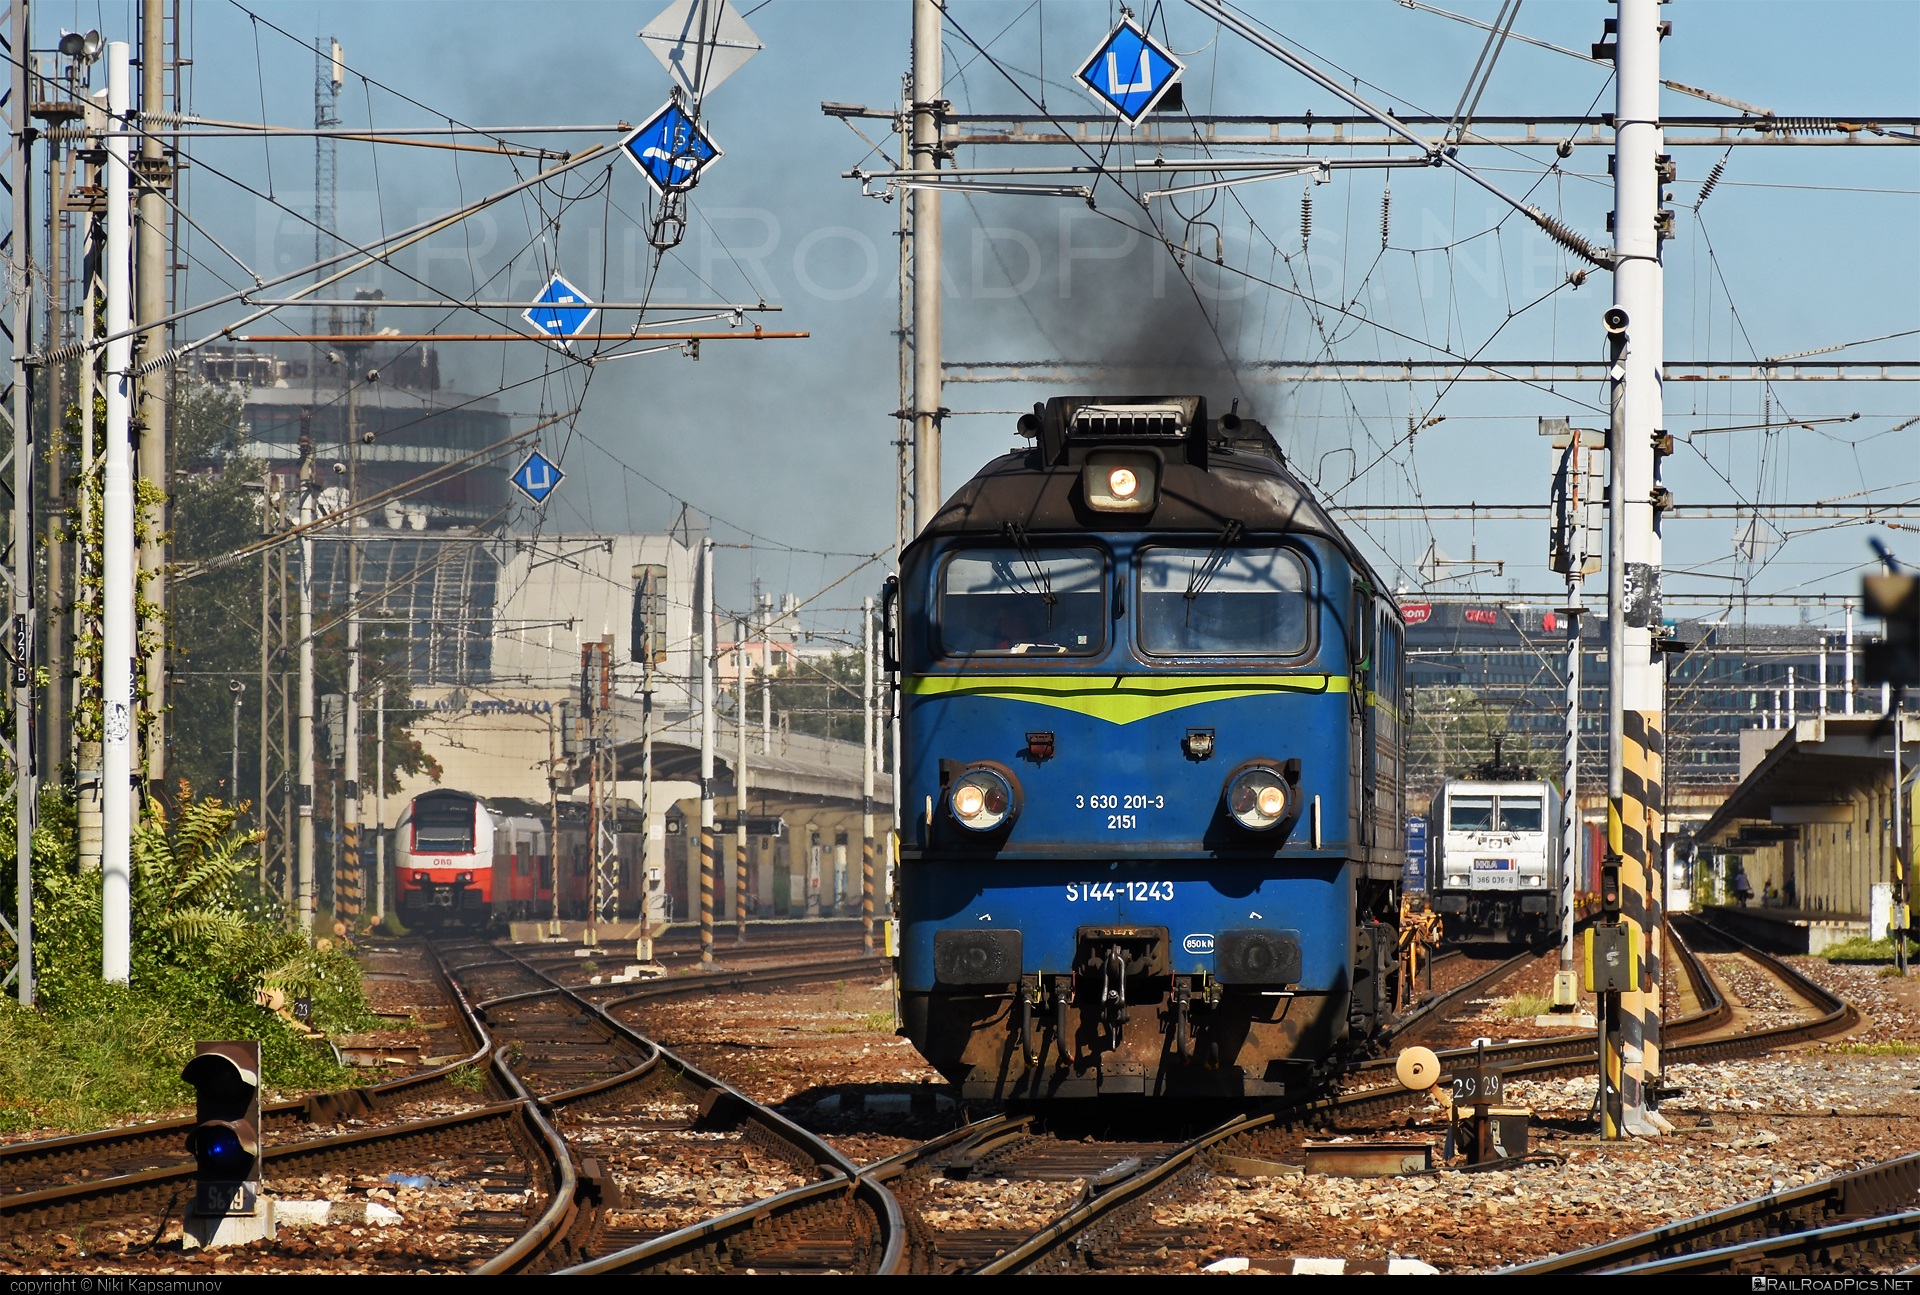 Lugansk M62 - 630 201-3 operated by PKP CARGO INTERNATIONAL a.s. #locomotivem62 #ltz #ltzm62 #lugansk #luganskteplovoz #luhansklocomotiveworks #luhanskm62 #luhanskteplovoz #m62 #m62locomotive #pkp #pkpcargo #pkpcargointernational #pkpcargointernationalas #pkpcargospolkaakcyjna #sergei